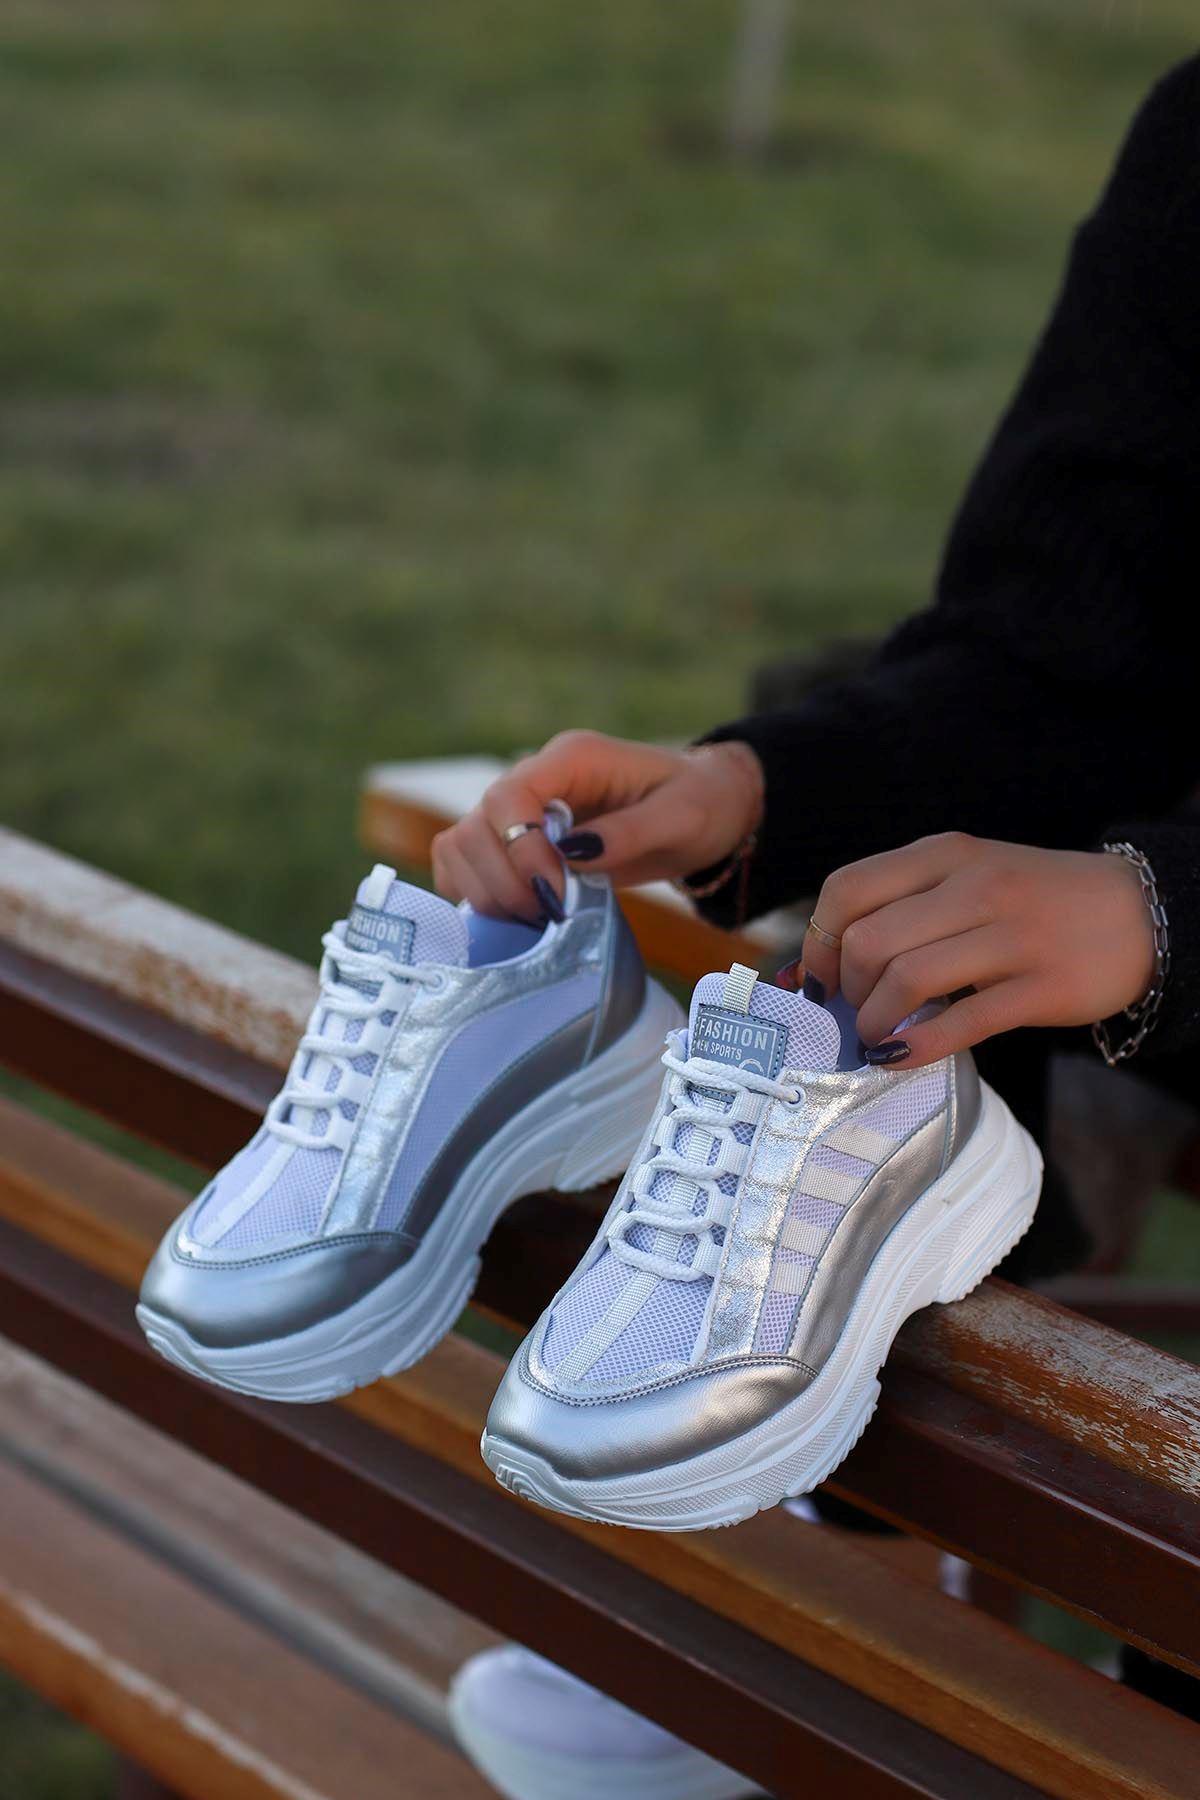 Frm-960 Fashion Spor Ayakkabı Gri